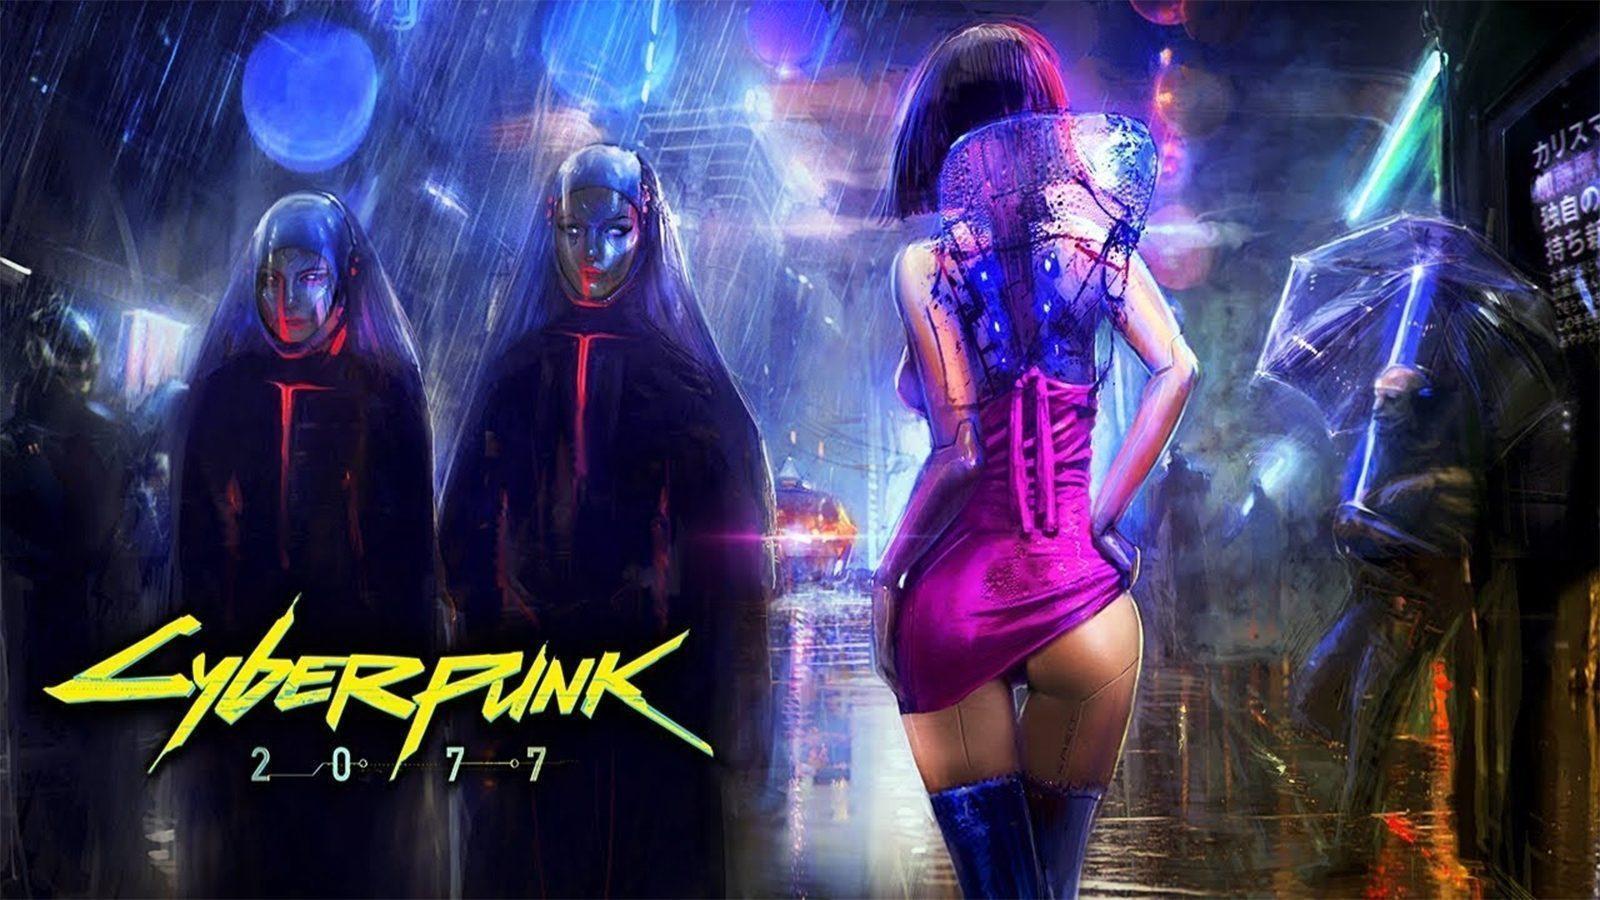 В CyberPunk 2077 будет секс от первого лица. 18+ (cyberpunk2077 gameplay released)